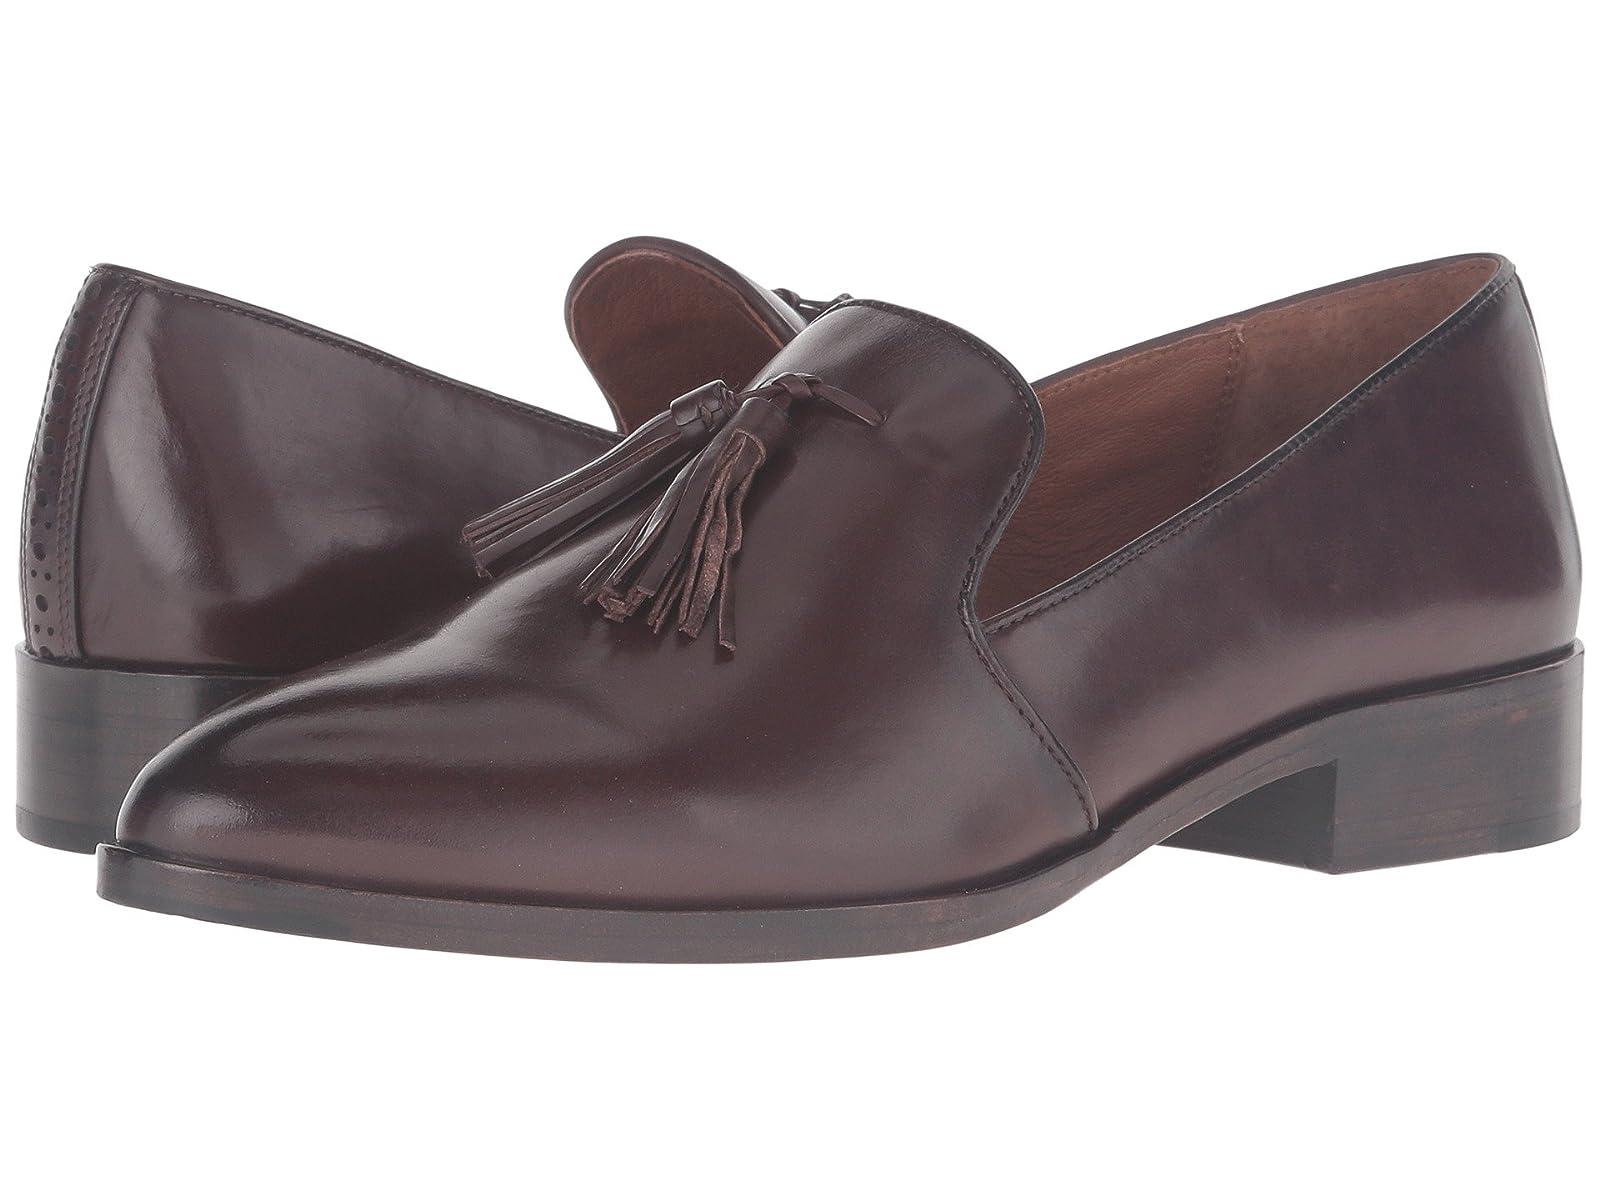 Frye Erica VenetianCheap and distinctive eye-catching shoes